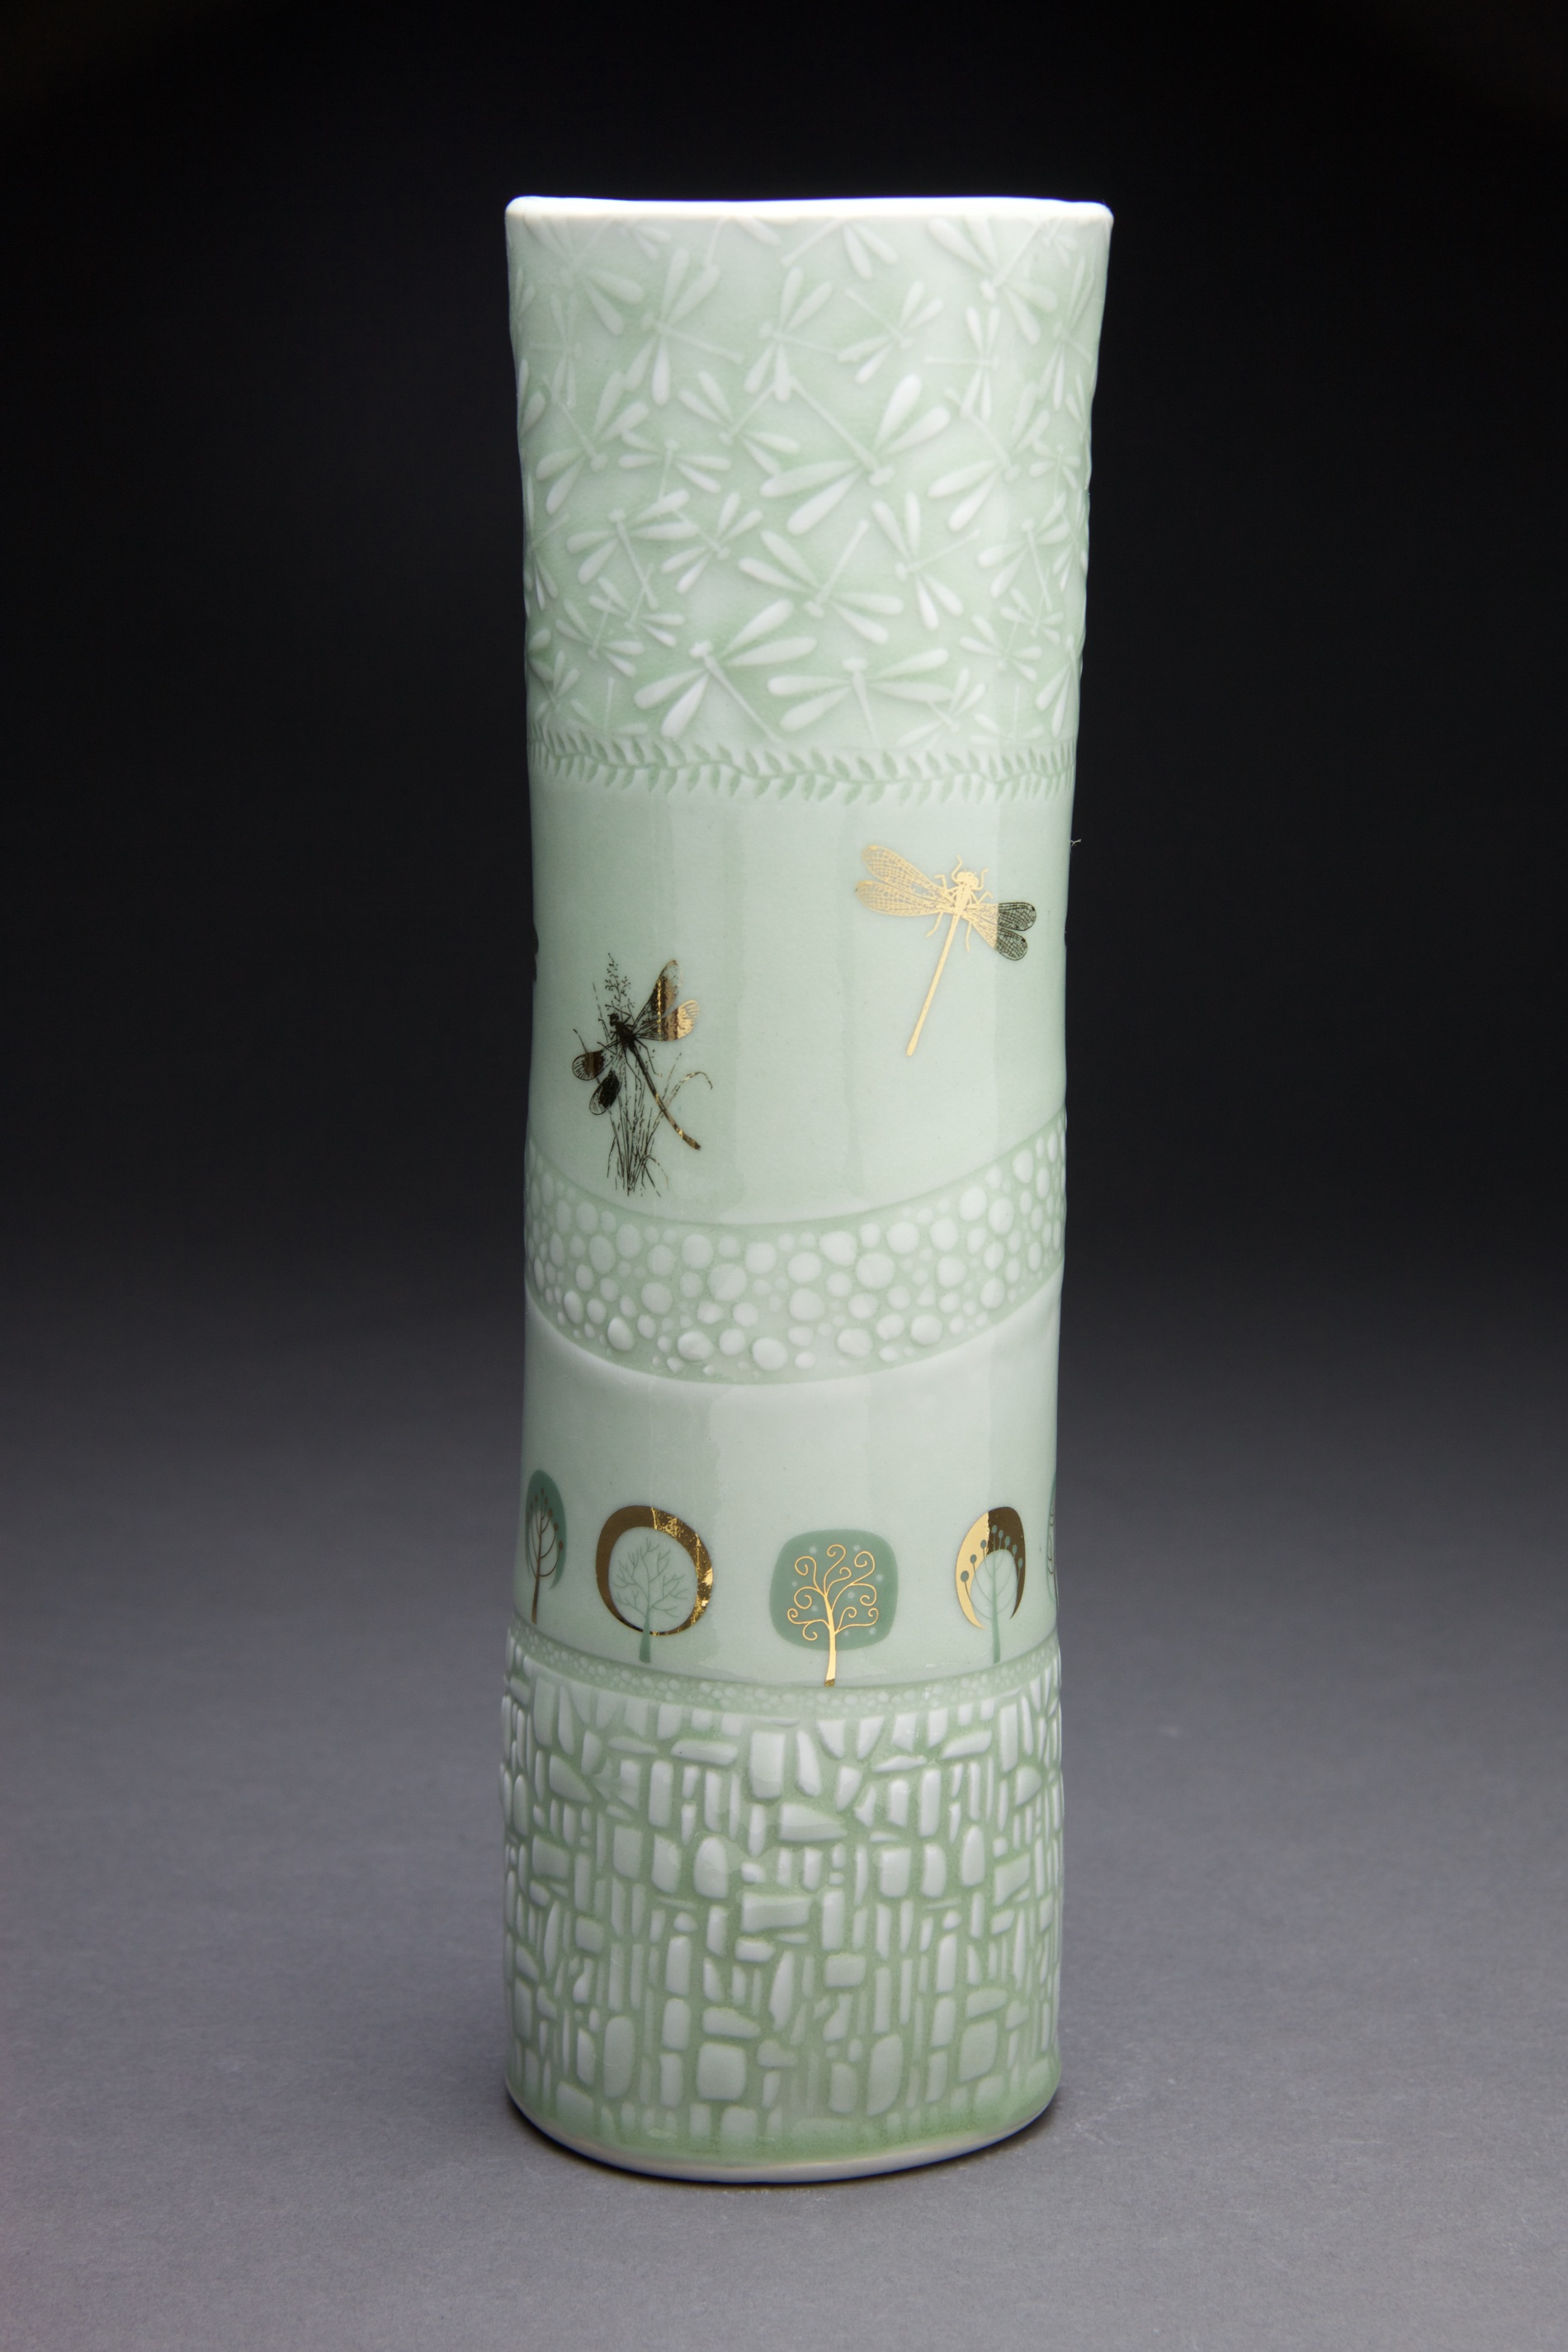 5x5x13 in vase. Light sage glaze with gold decals